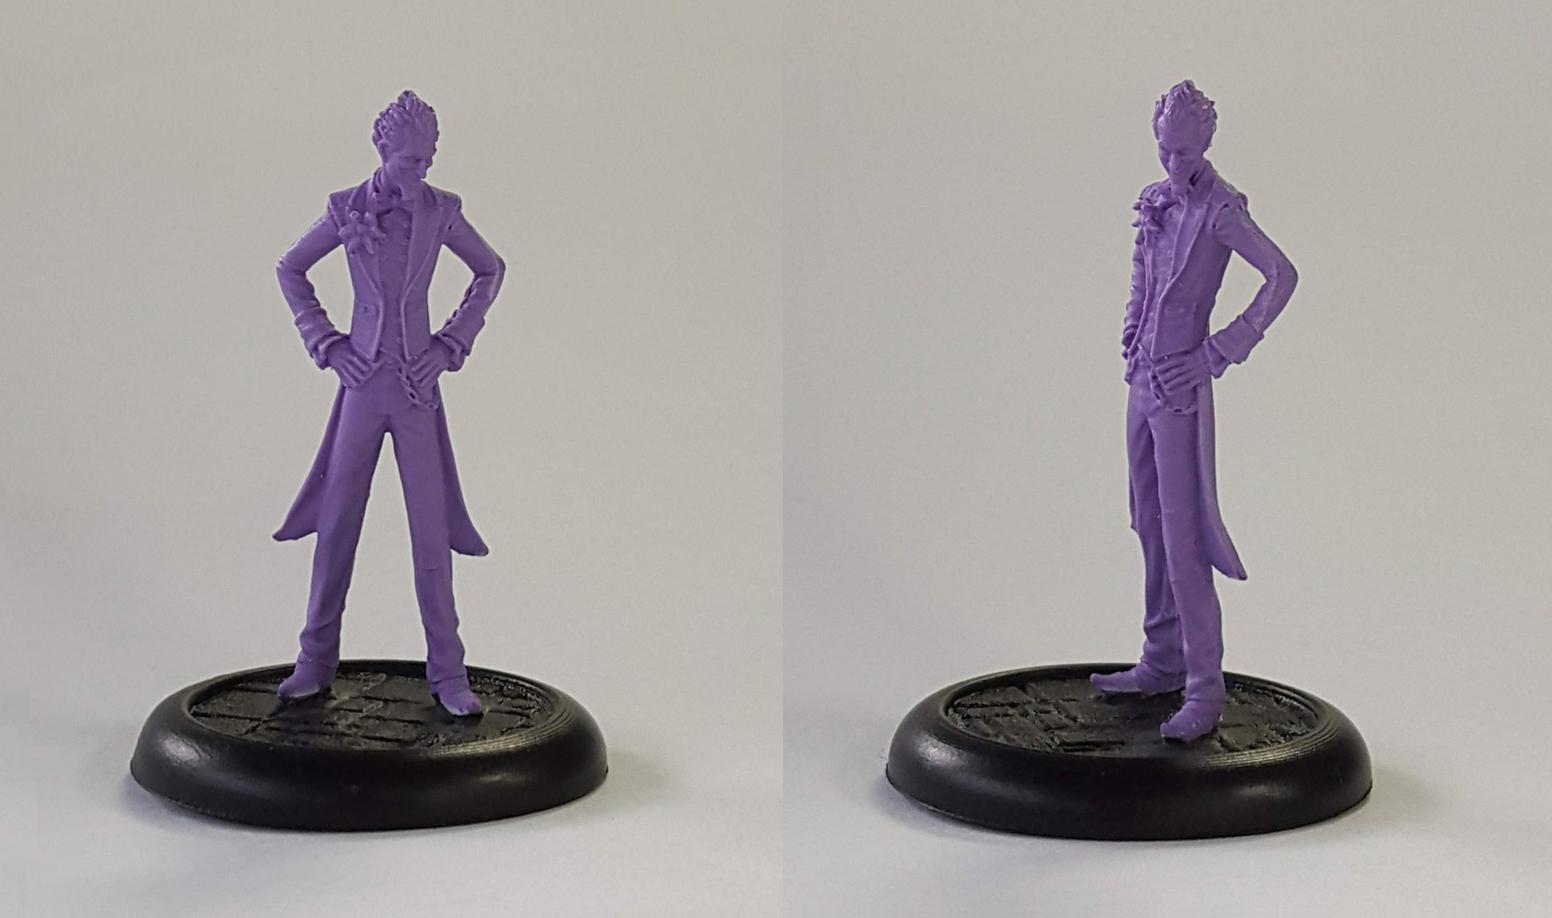 Joker Miniature Figure